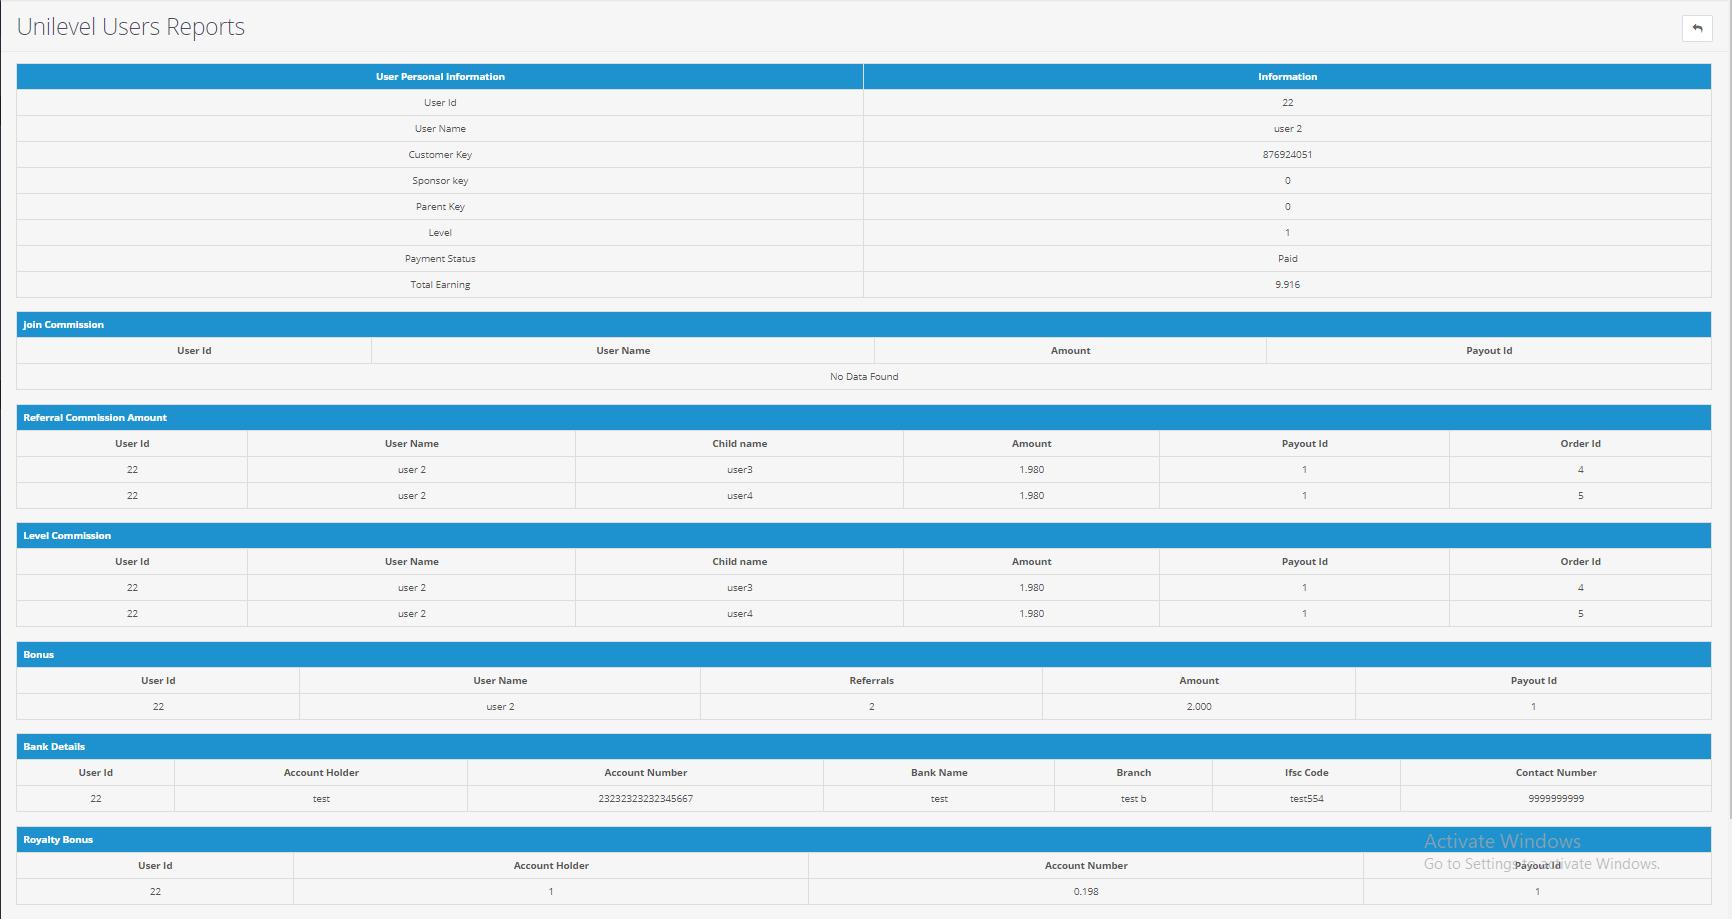 |'Opencart'| |'letscms'| |'opencart unilevel mlm plan'| |'user information'| |'user report'| |'Dashboard'| |'unilevel mlm plan'| |'mlm'| |'mlm Plan'|  |'setting'| |'new users'| |'unilevel'| |'unilevel mlm extension'| |'costomer list'| |'new users'| |'Installer'| |'mlmtrees.com'| |'mlm plan'| |'extension'| |'Opencart mlm plan'|